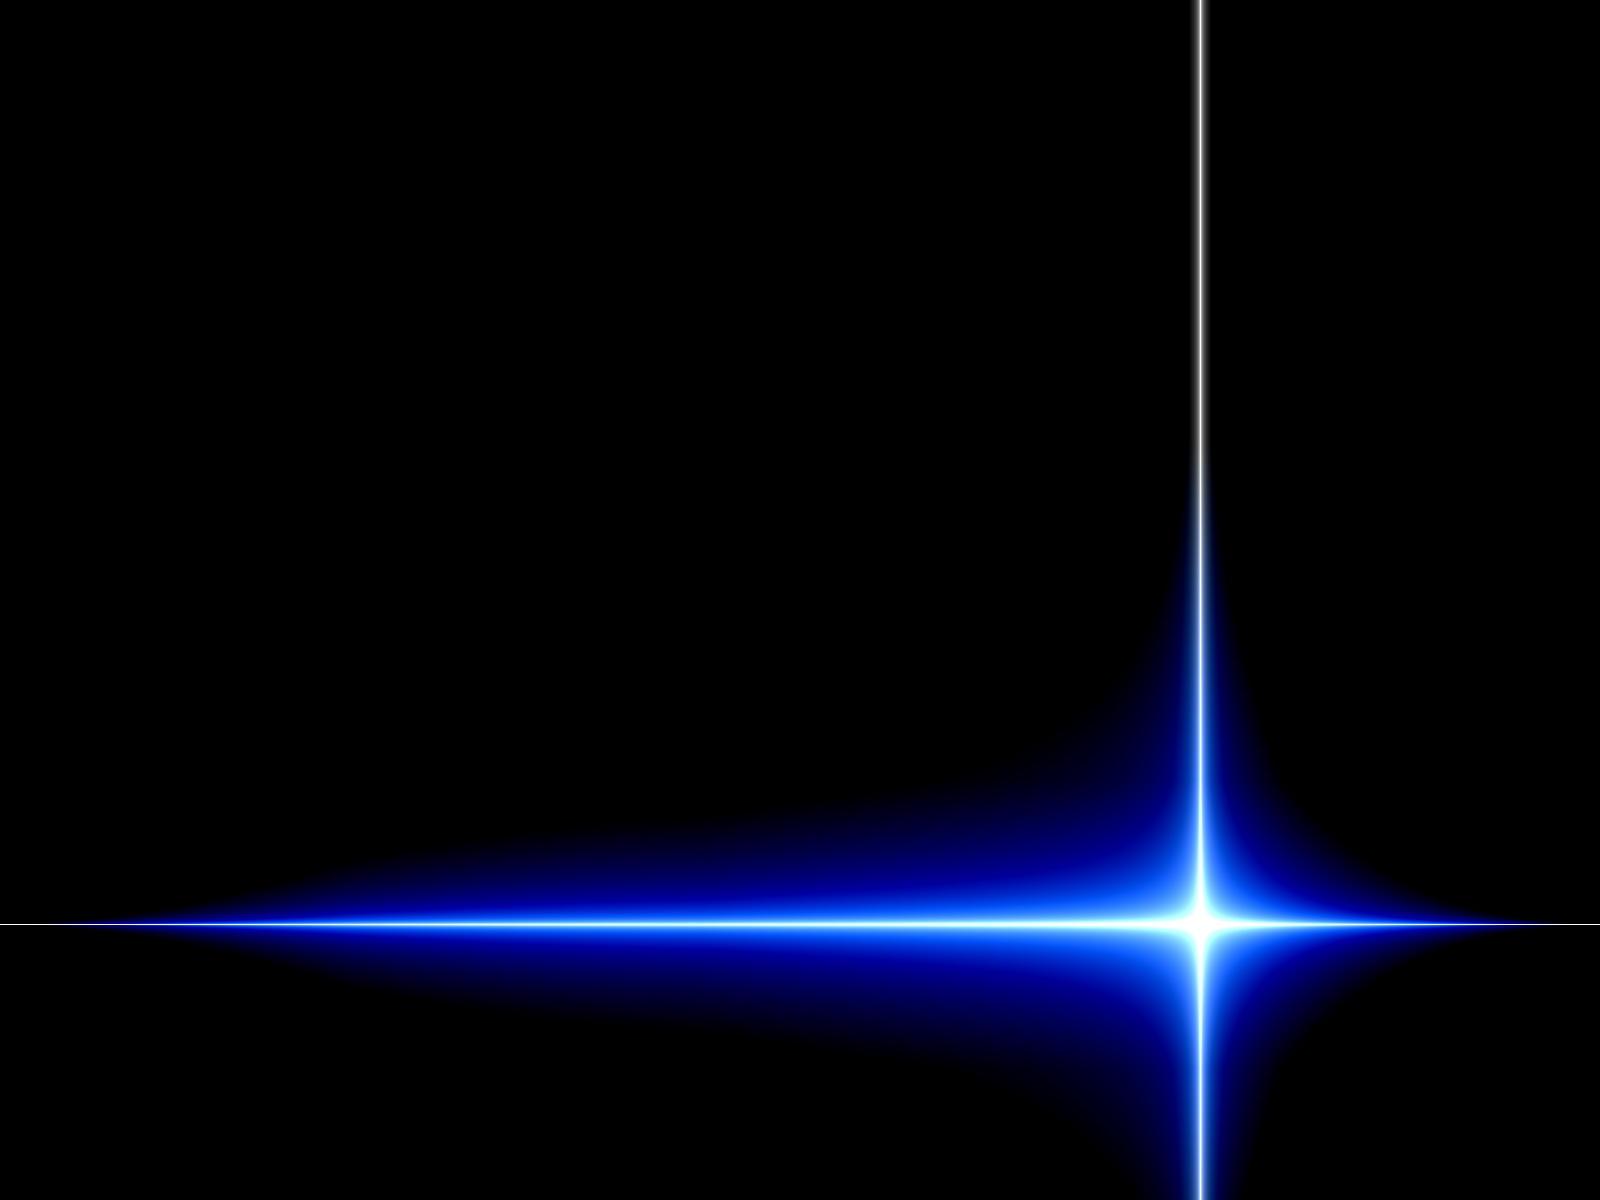 Blue Flash By Twinelens On Deviantart